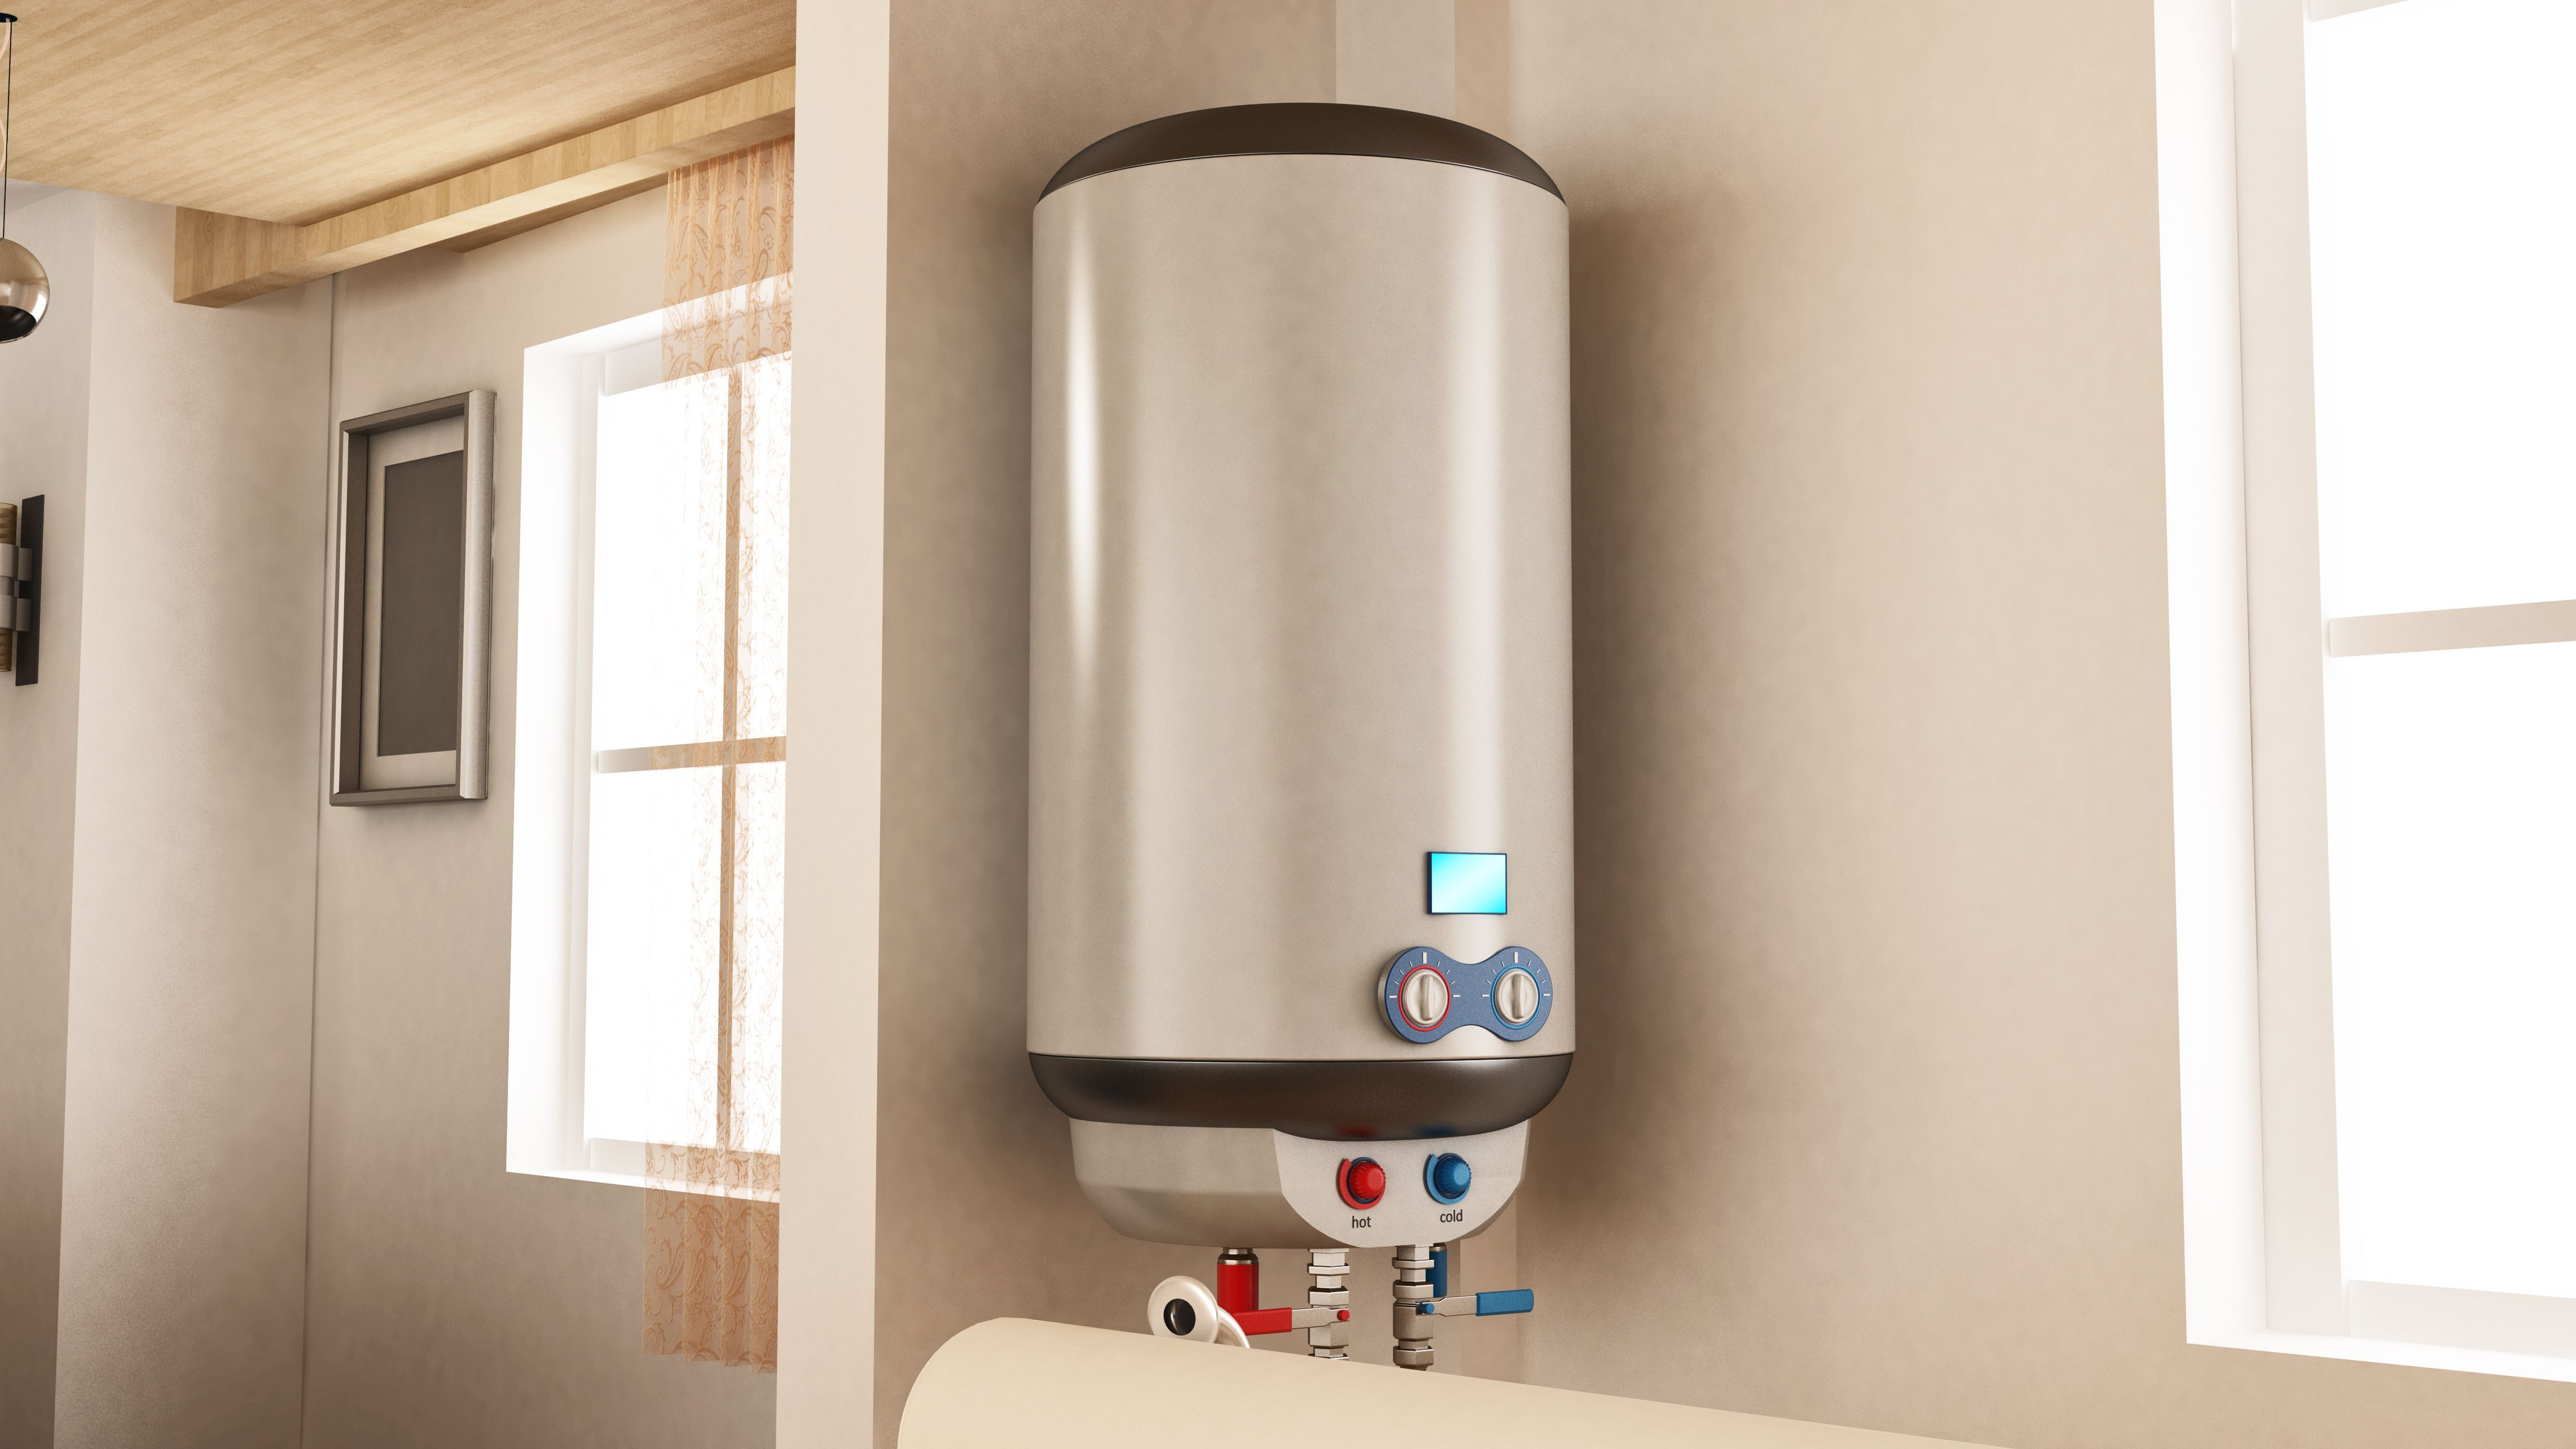 Comment choisir son chauffe-eau thermodynamique